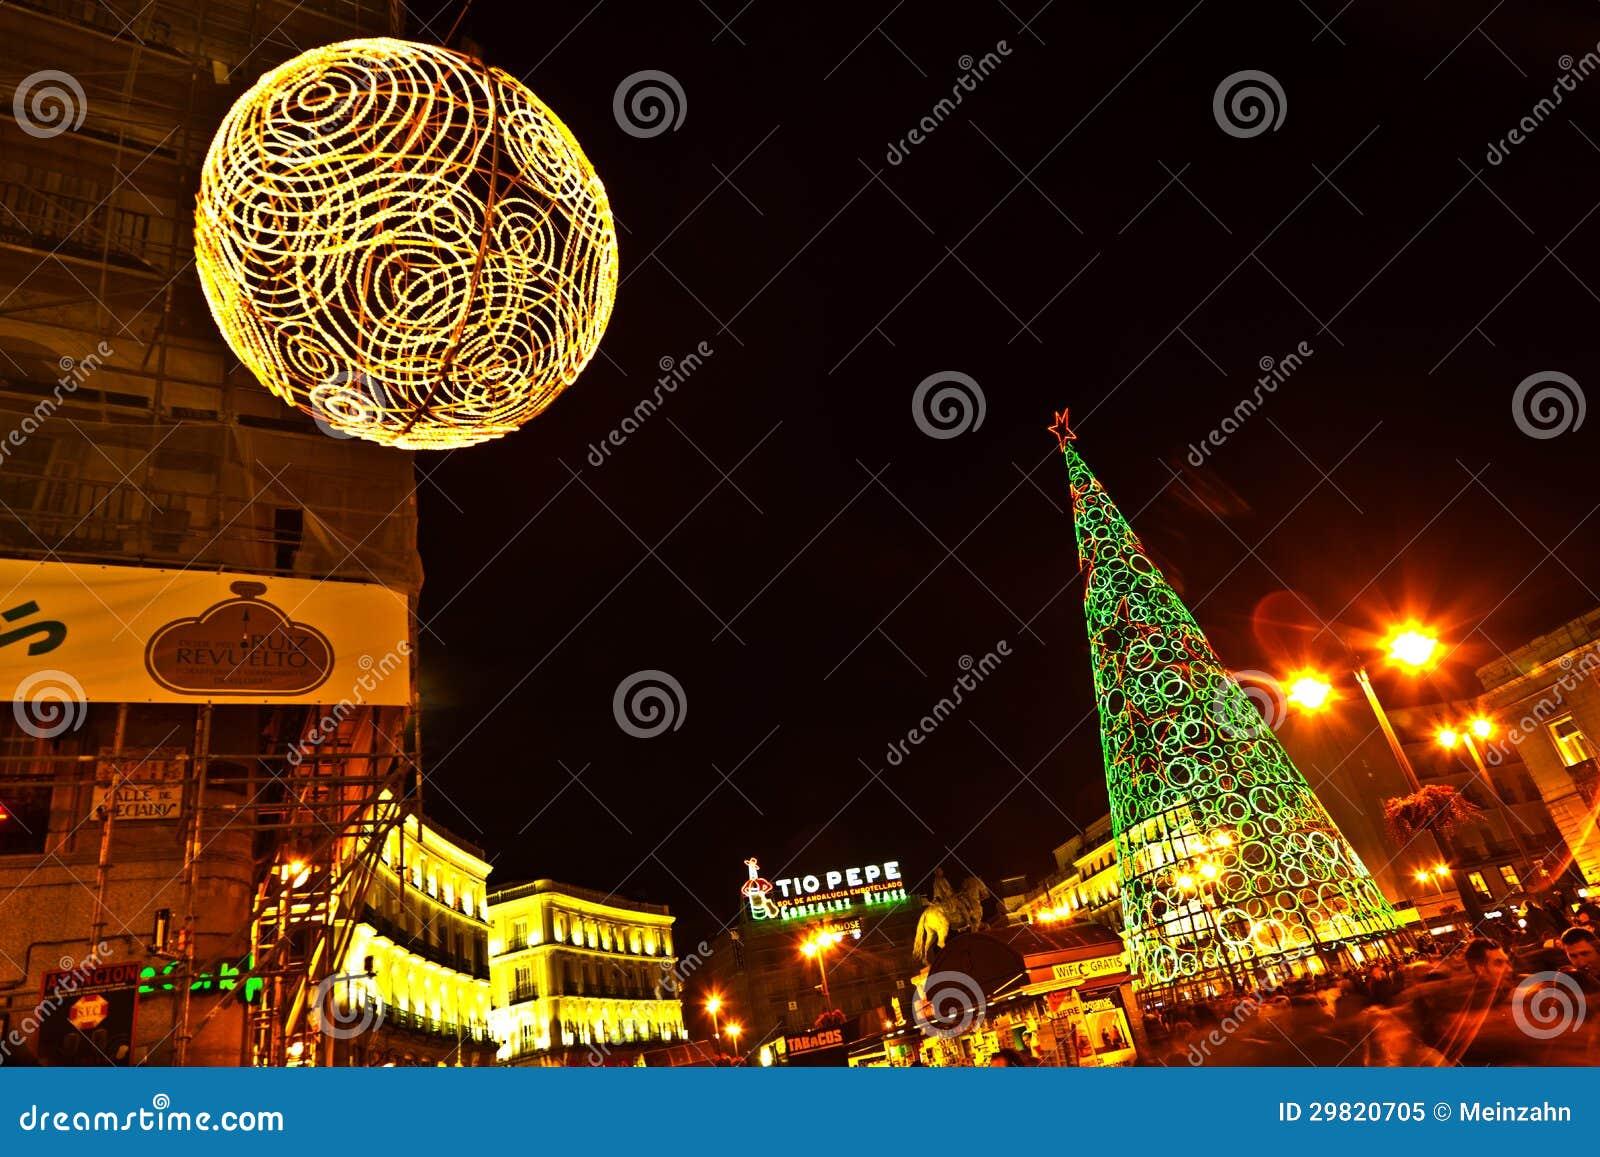 D coration lumineuse de no l madrid espagne image ditorial image 29820705 - Decoration lumineuse de noel ...